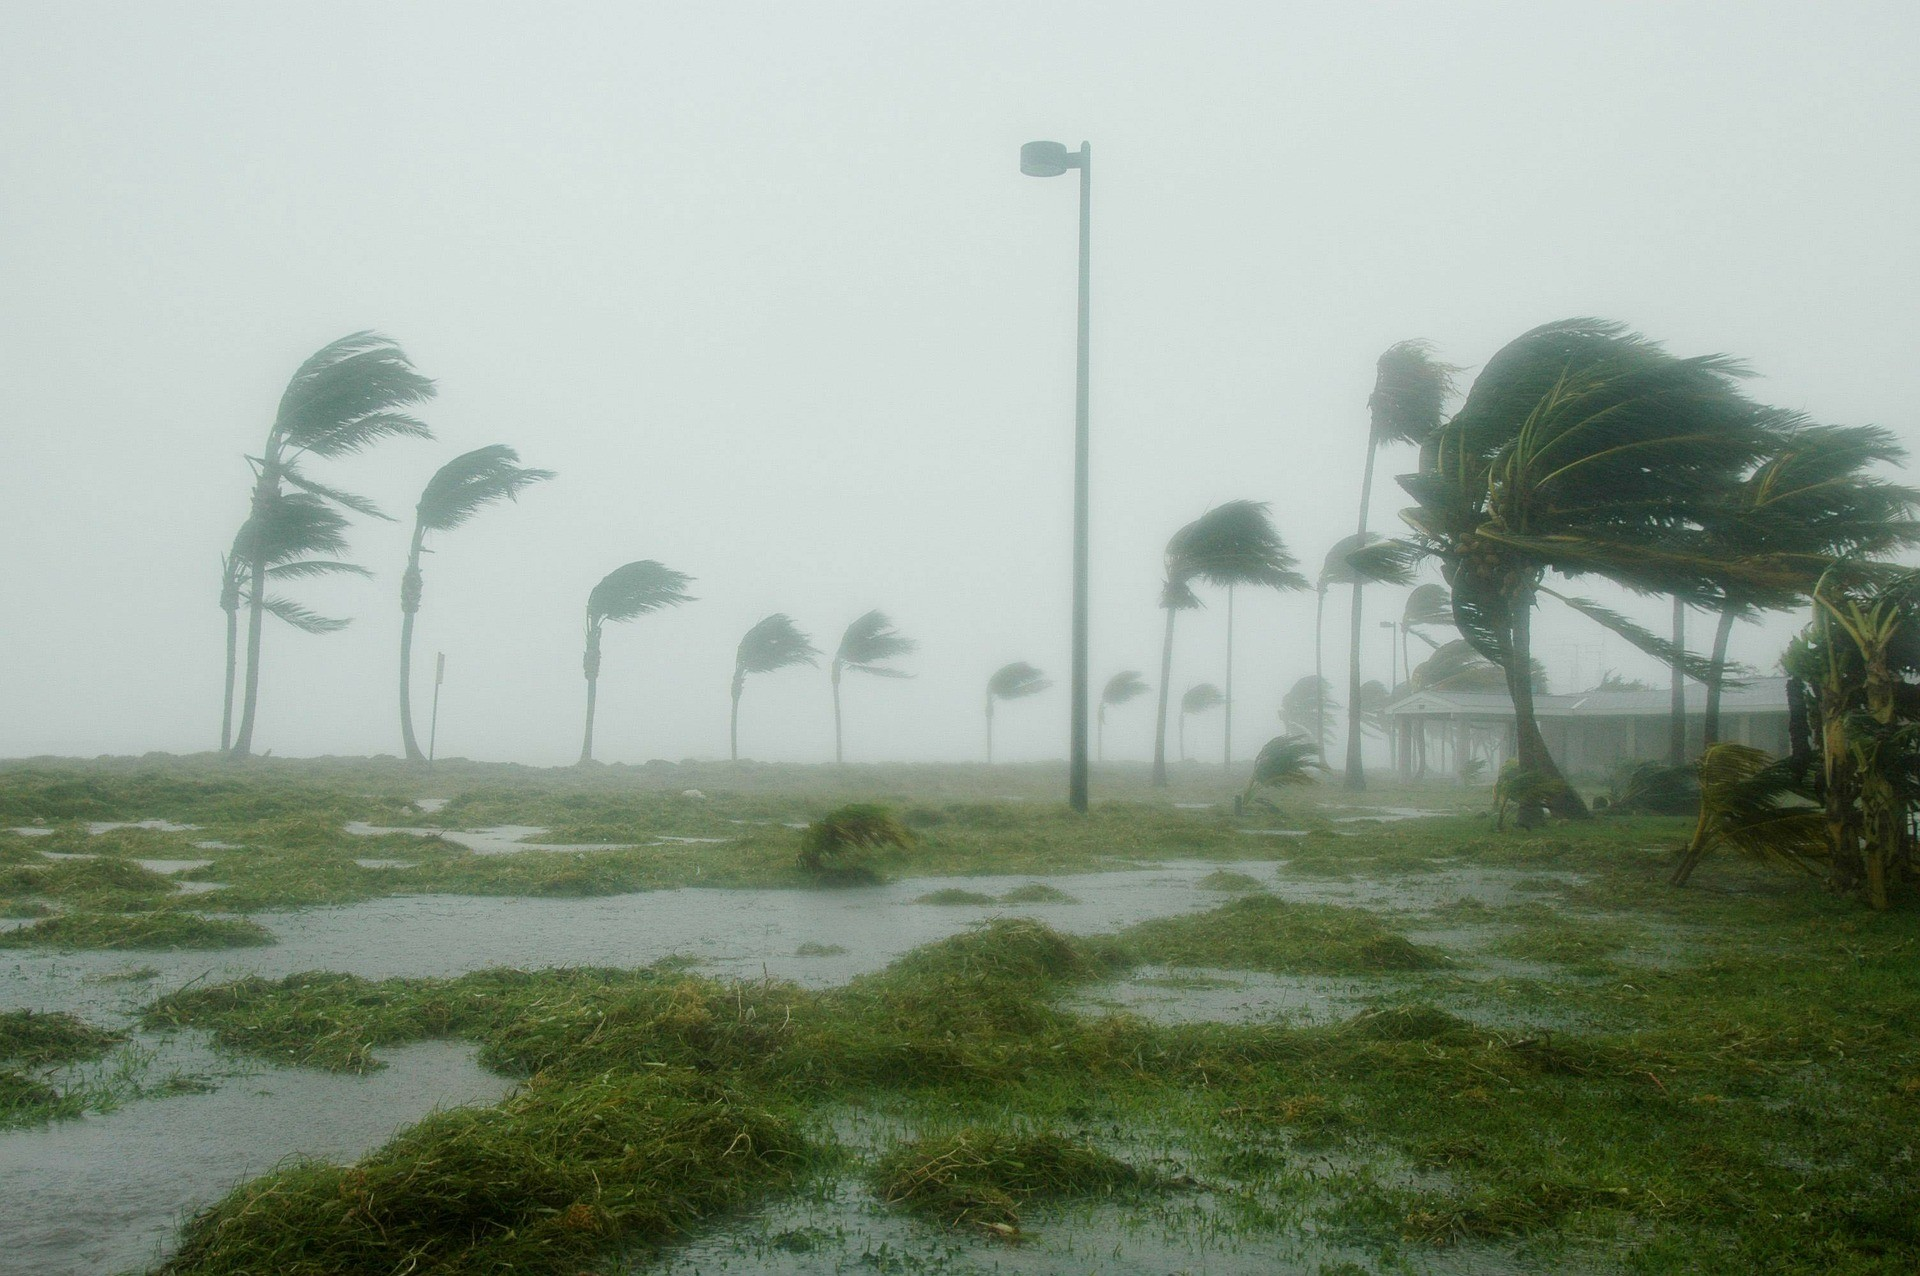 "<p><span>Фото: &copy; Pixabay /&nbsp;</span><a href=""https://pixabay.com/en/key-west-florida-hurricane-dennis-86025/"">12019</a></p>"